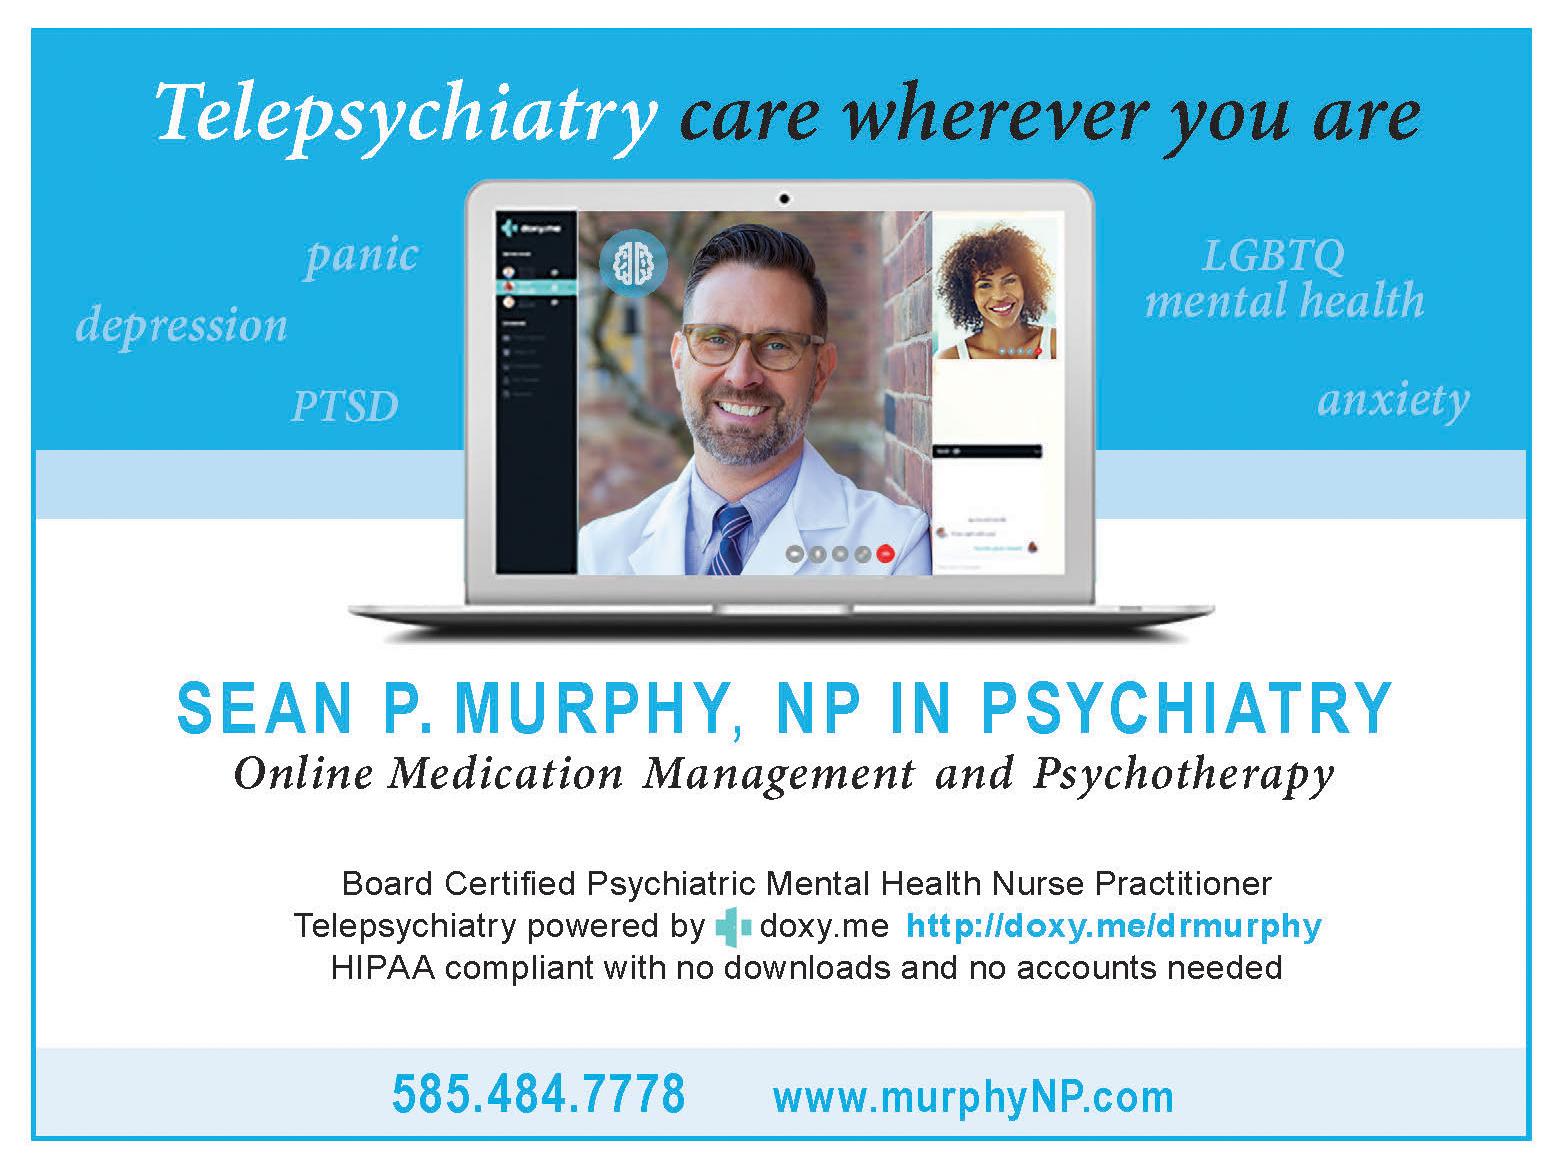 MurphyNP_ad_040119.jpg